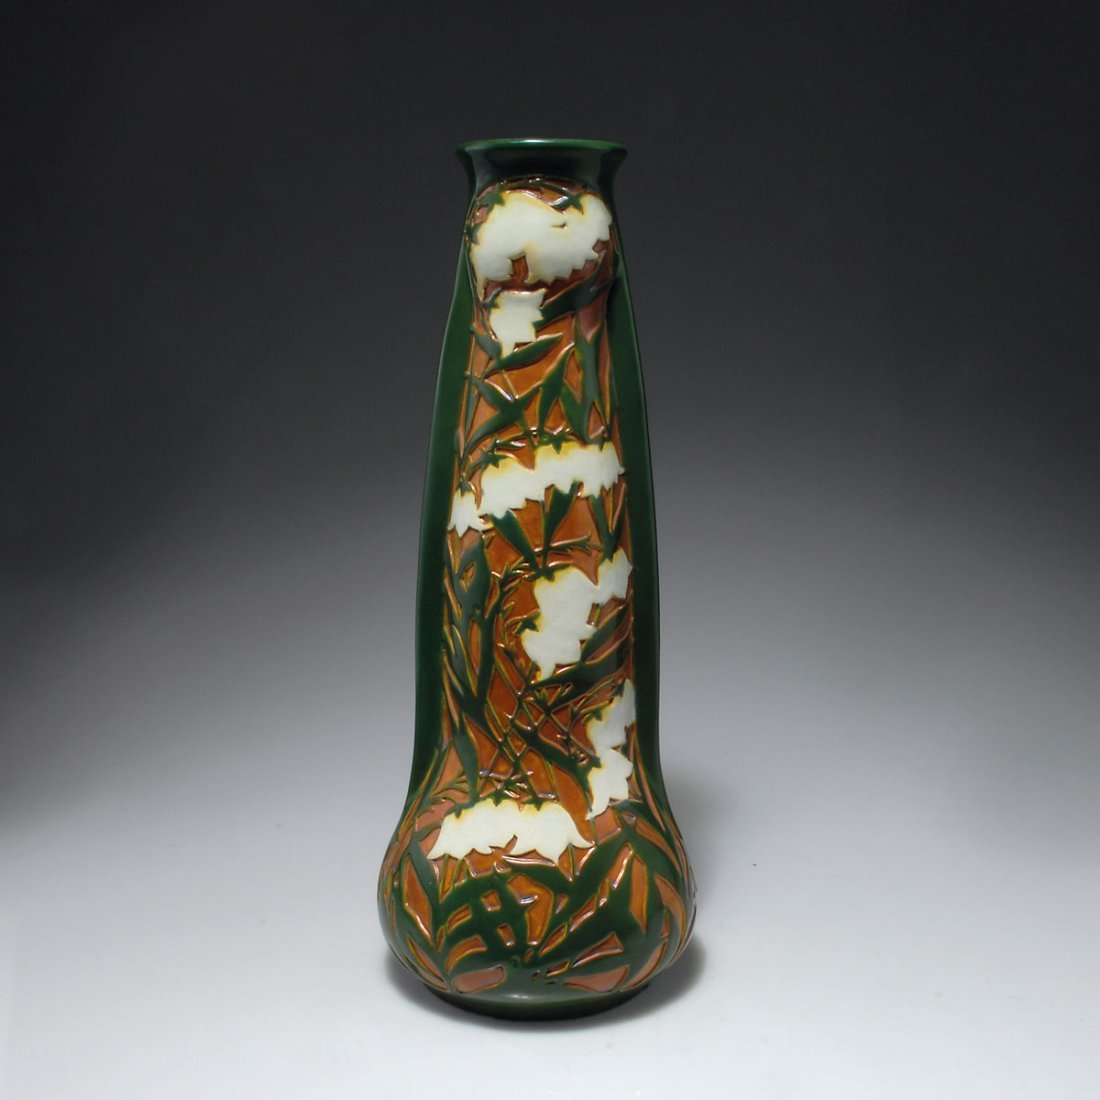 527: Hohe Vase mit Glockenblumen, 1903-04